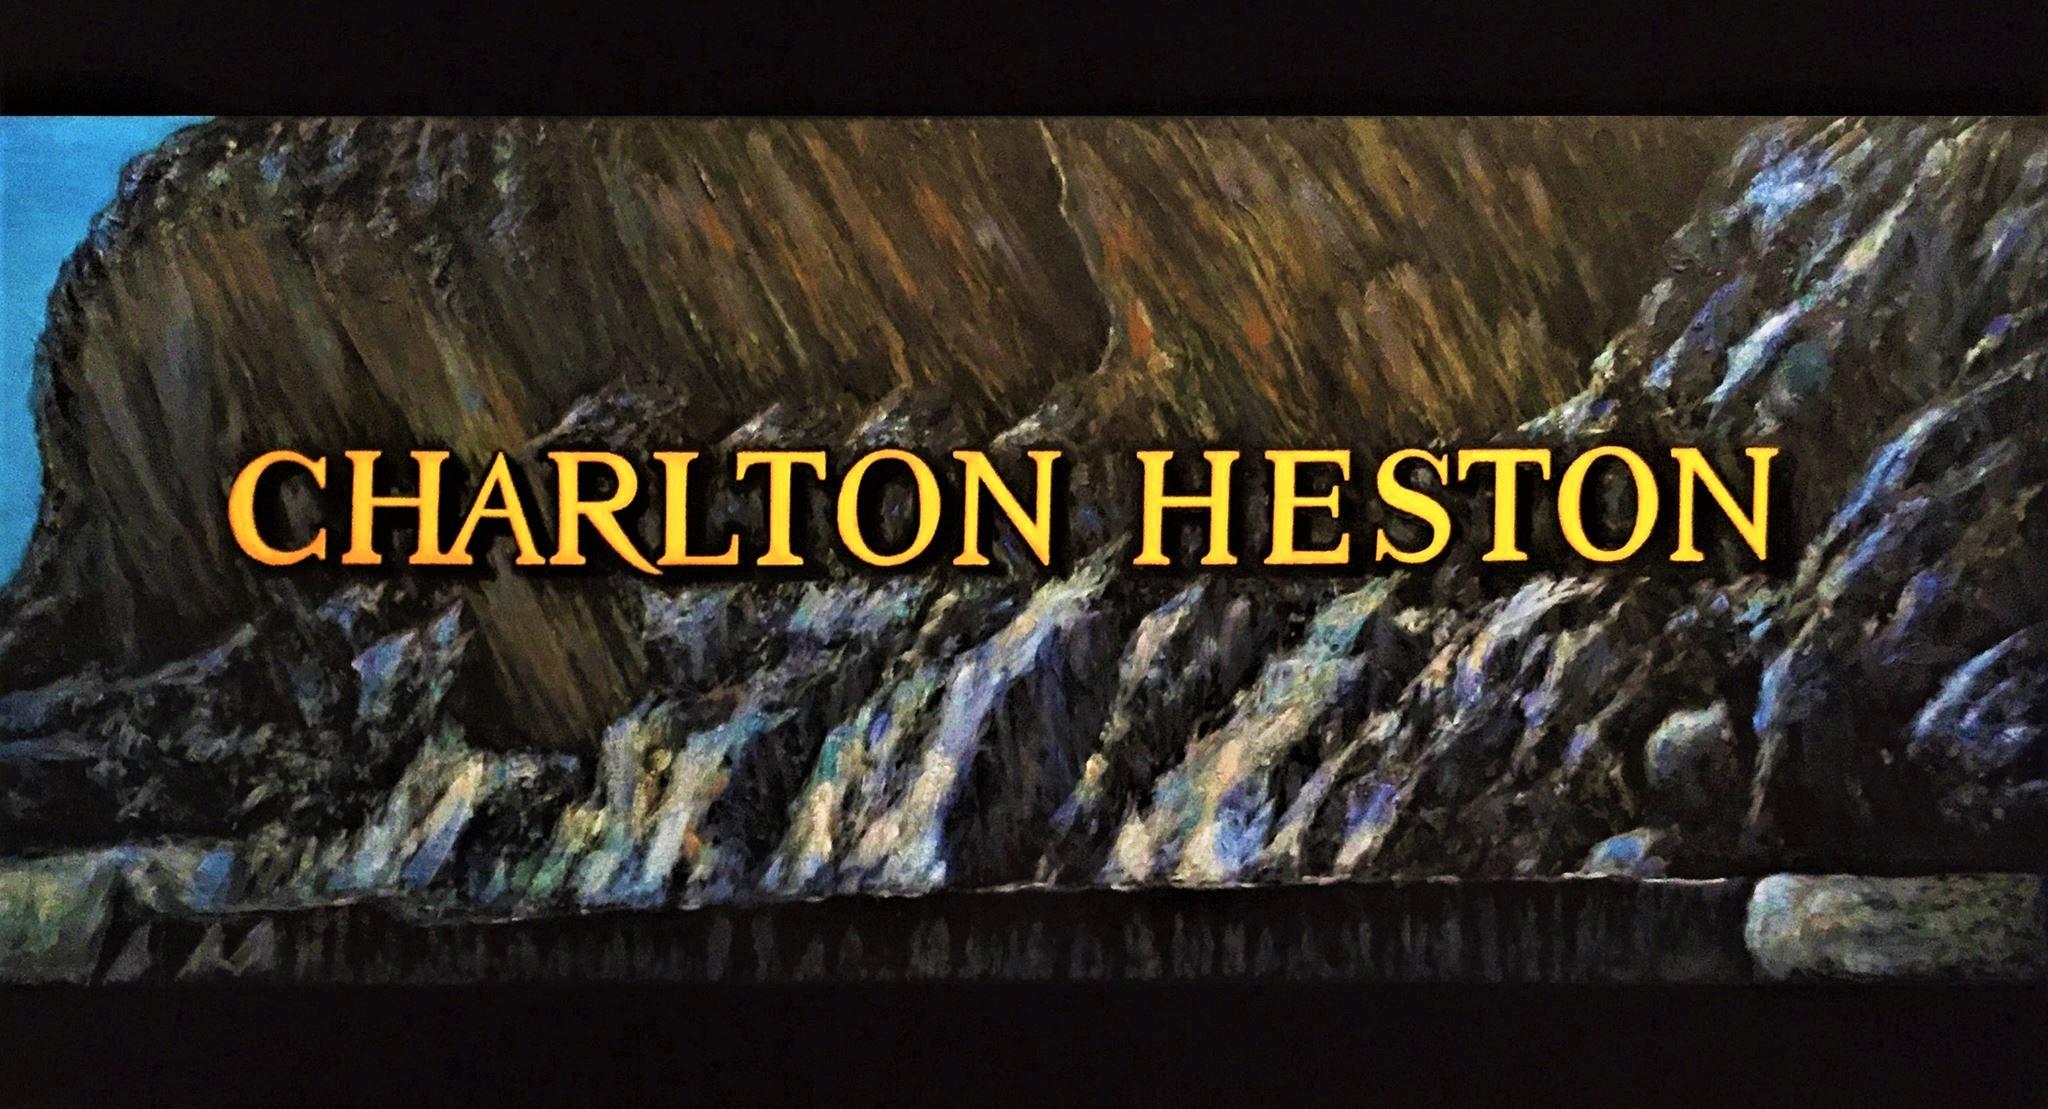 Charlton Heston (2017) - Héctor Meana